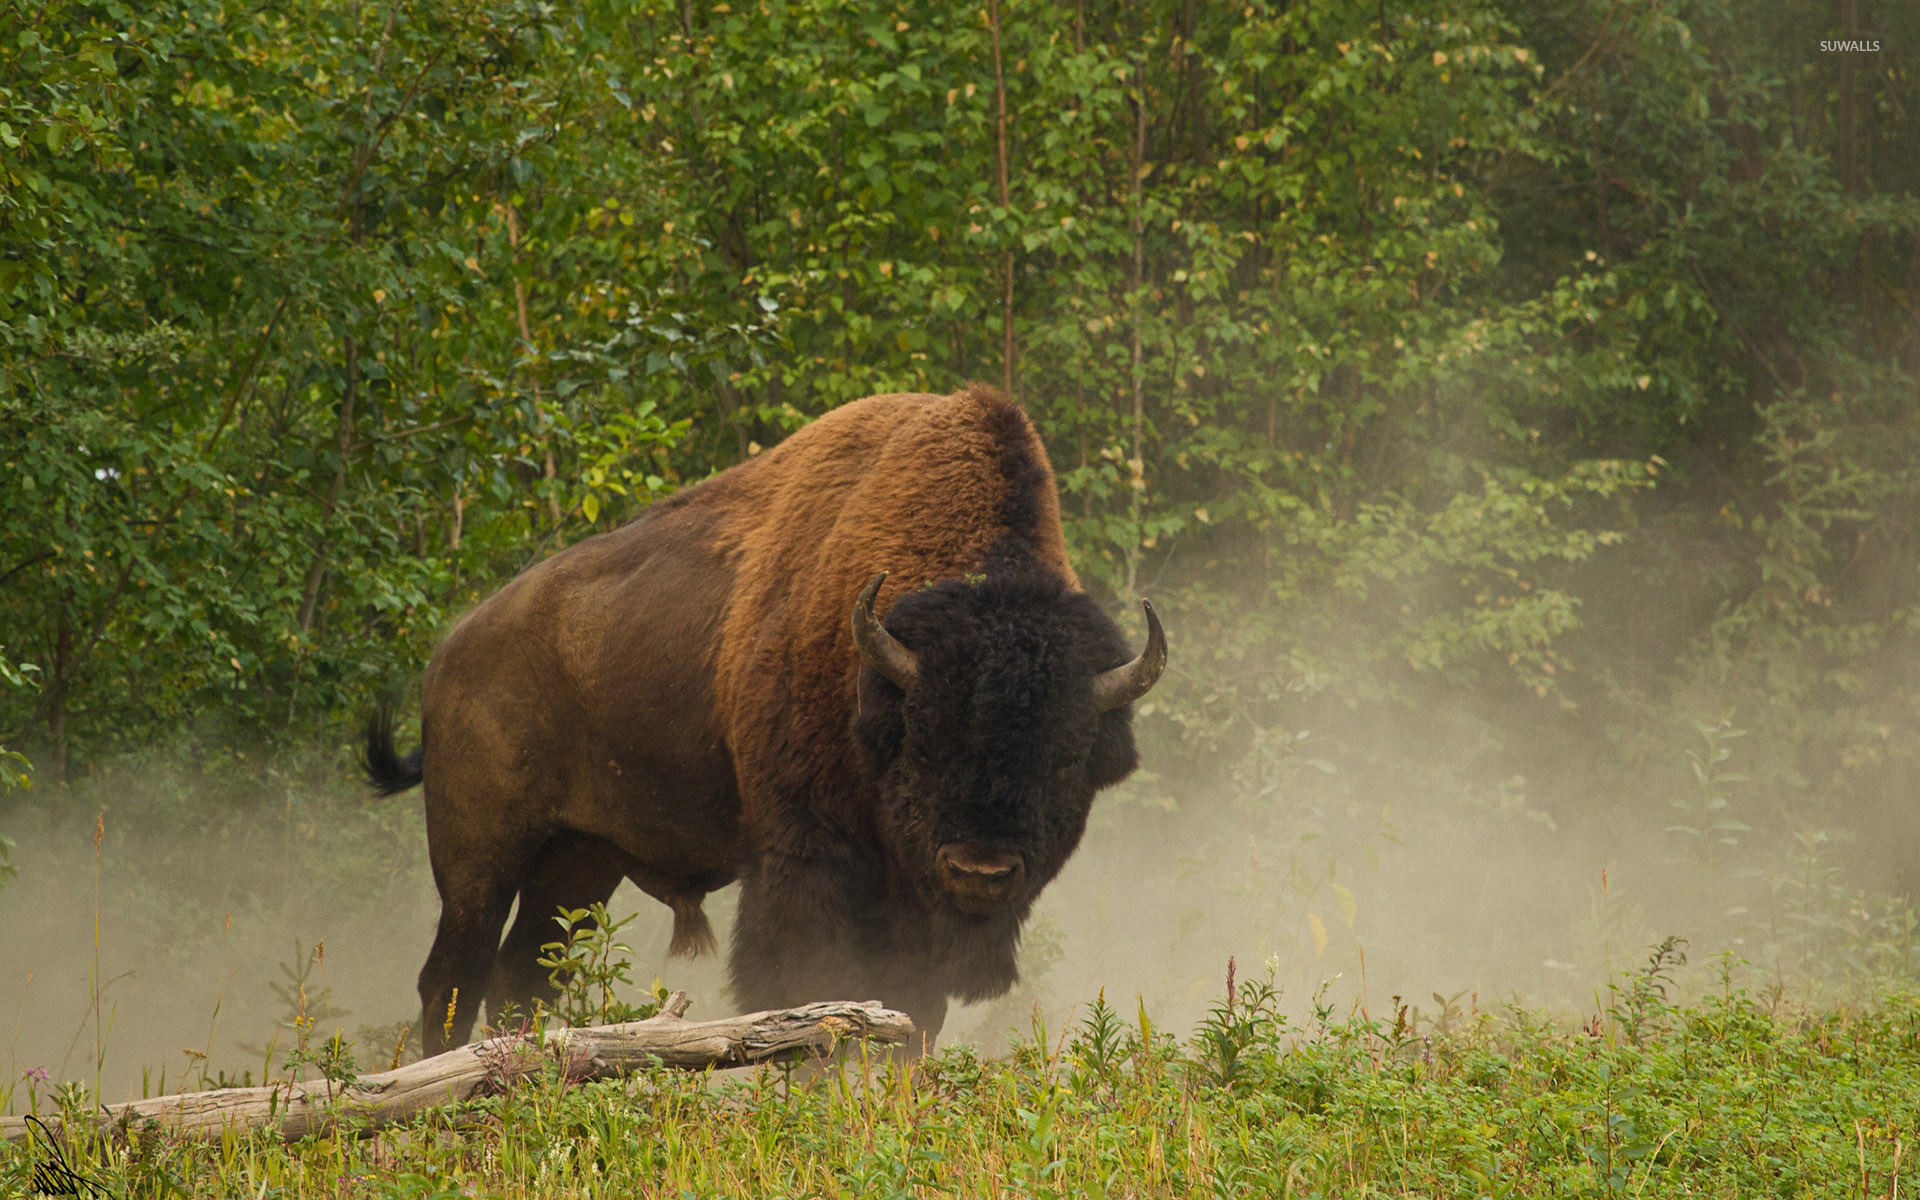 Amazing Bison Wallpaper - bison-37214-1920x1200  Gallery_442416.jpg